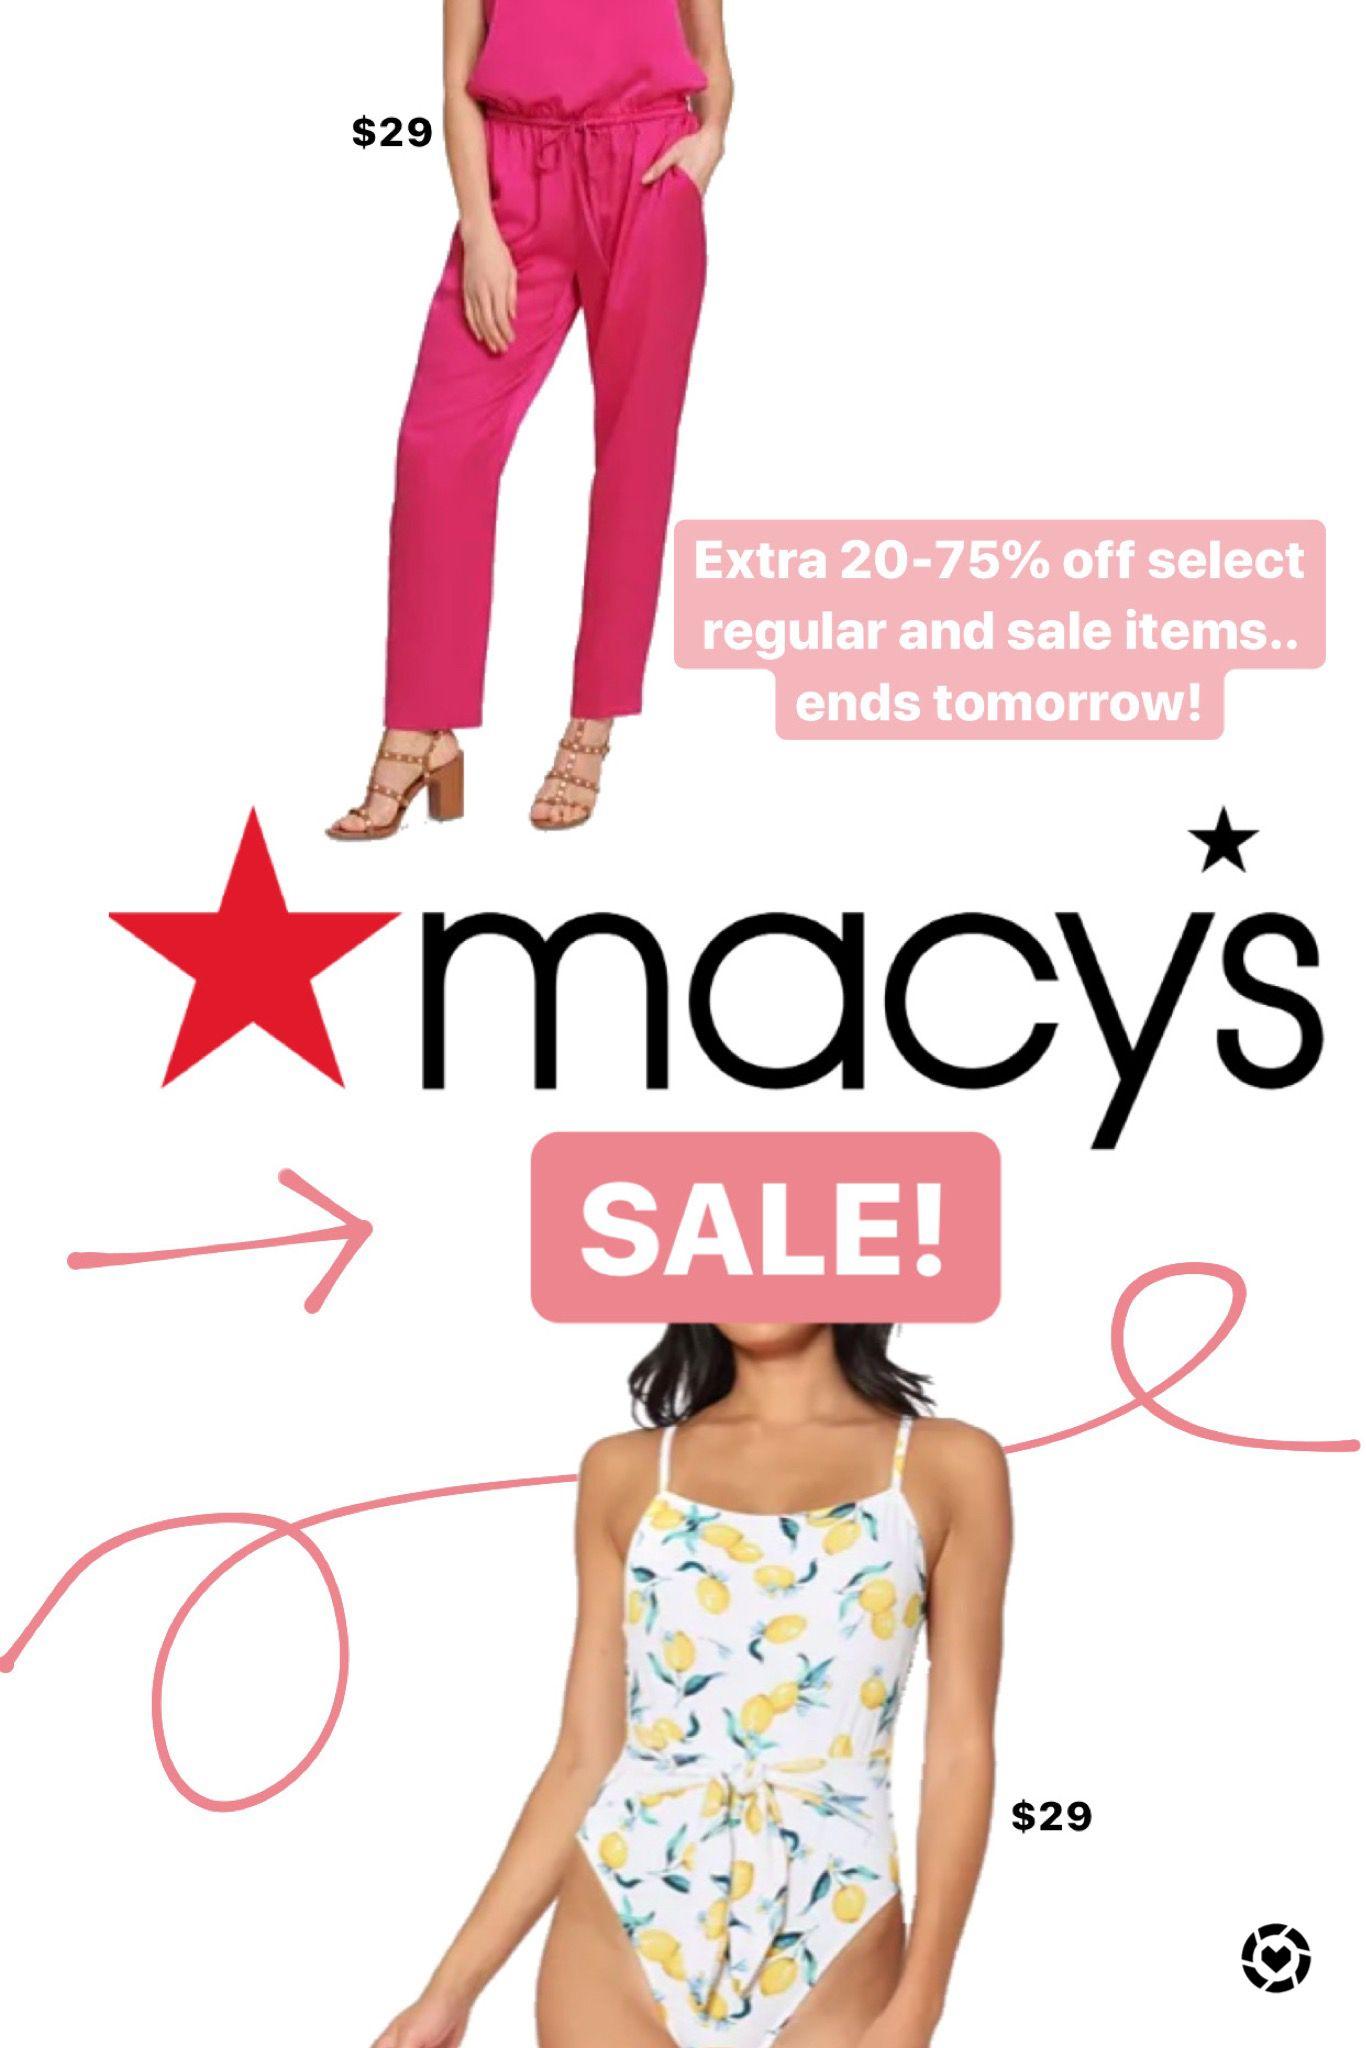 Huge Macy's sale! Ends 6/25 in 2020 Pics, Macys, Macys sale